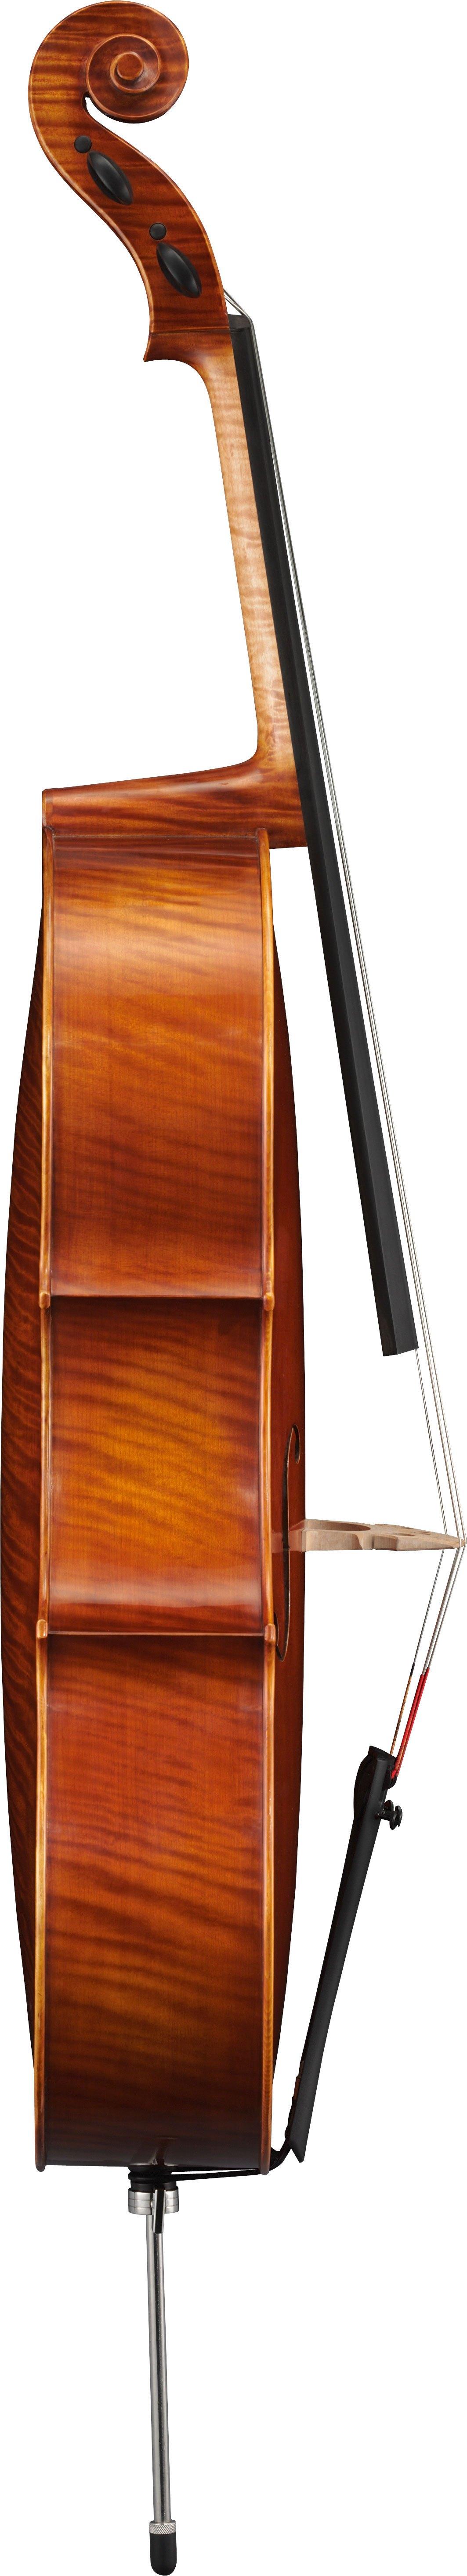 Violoncello Yamaha VC20G